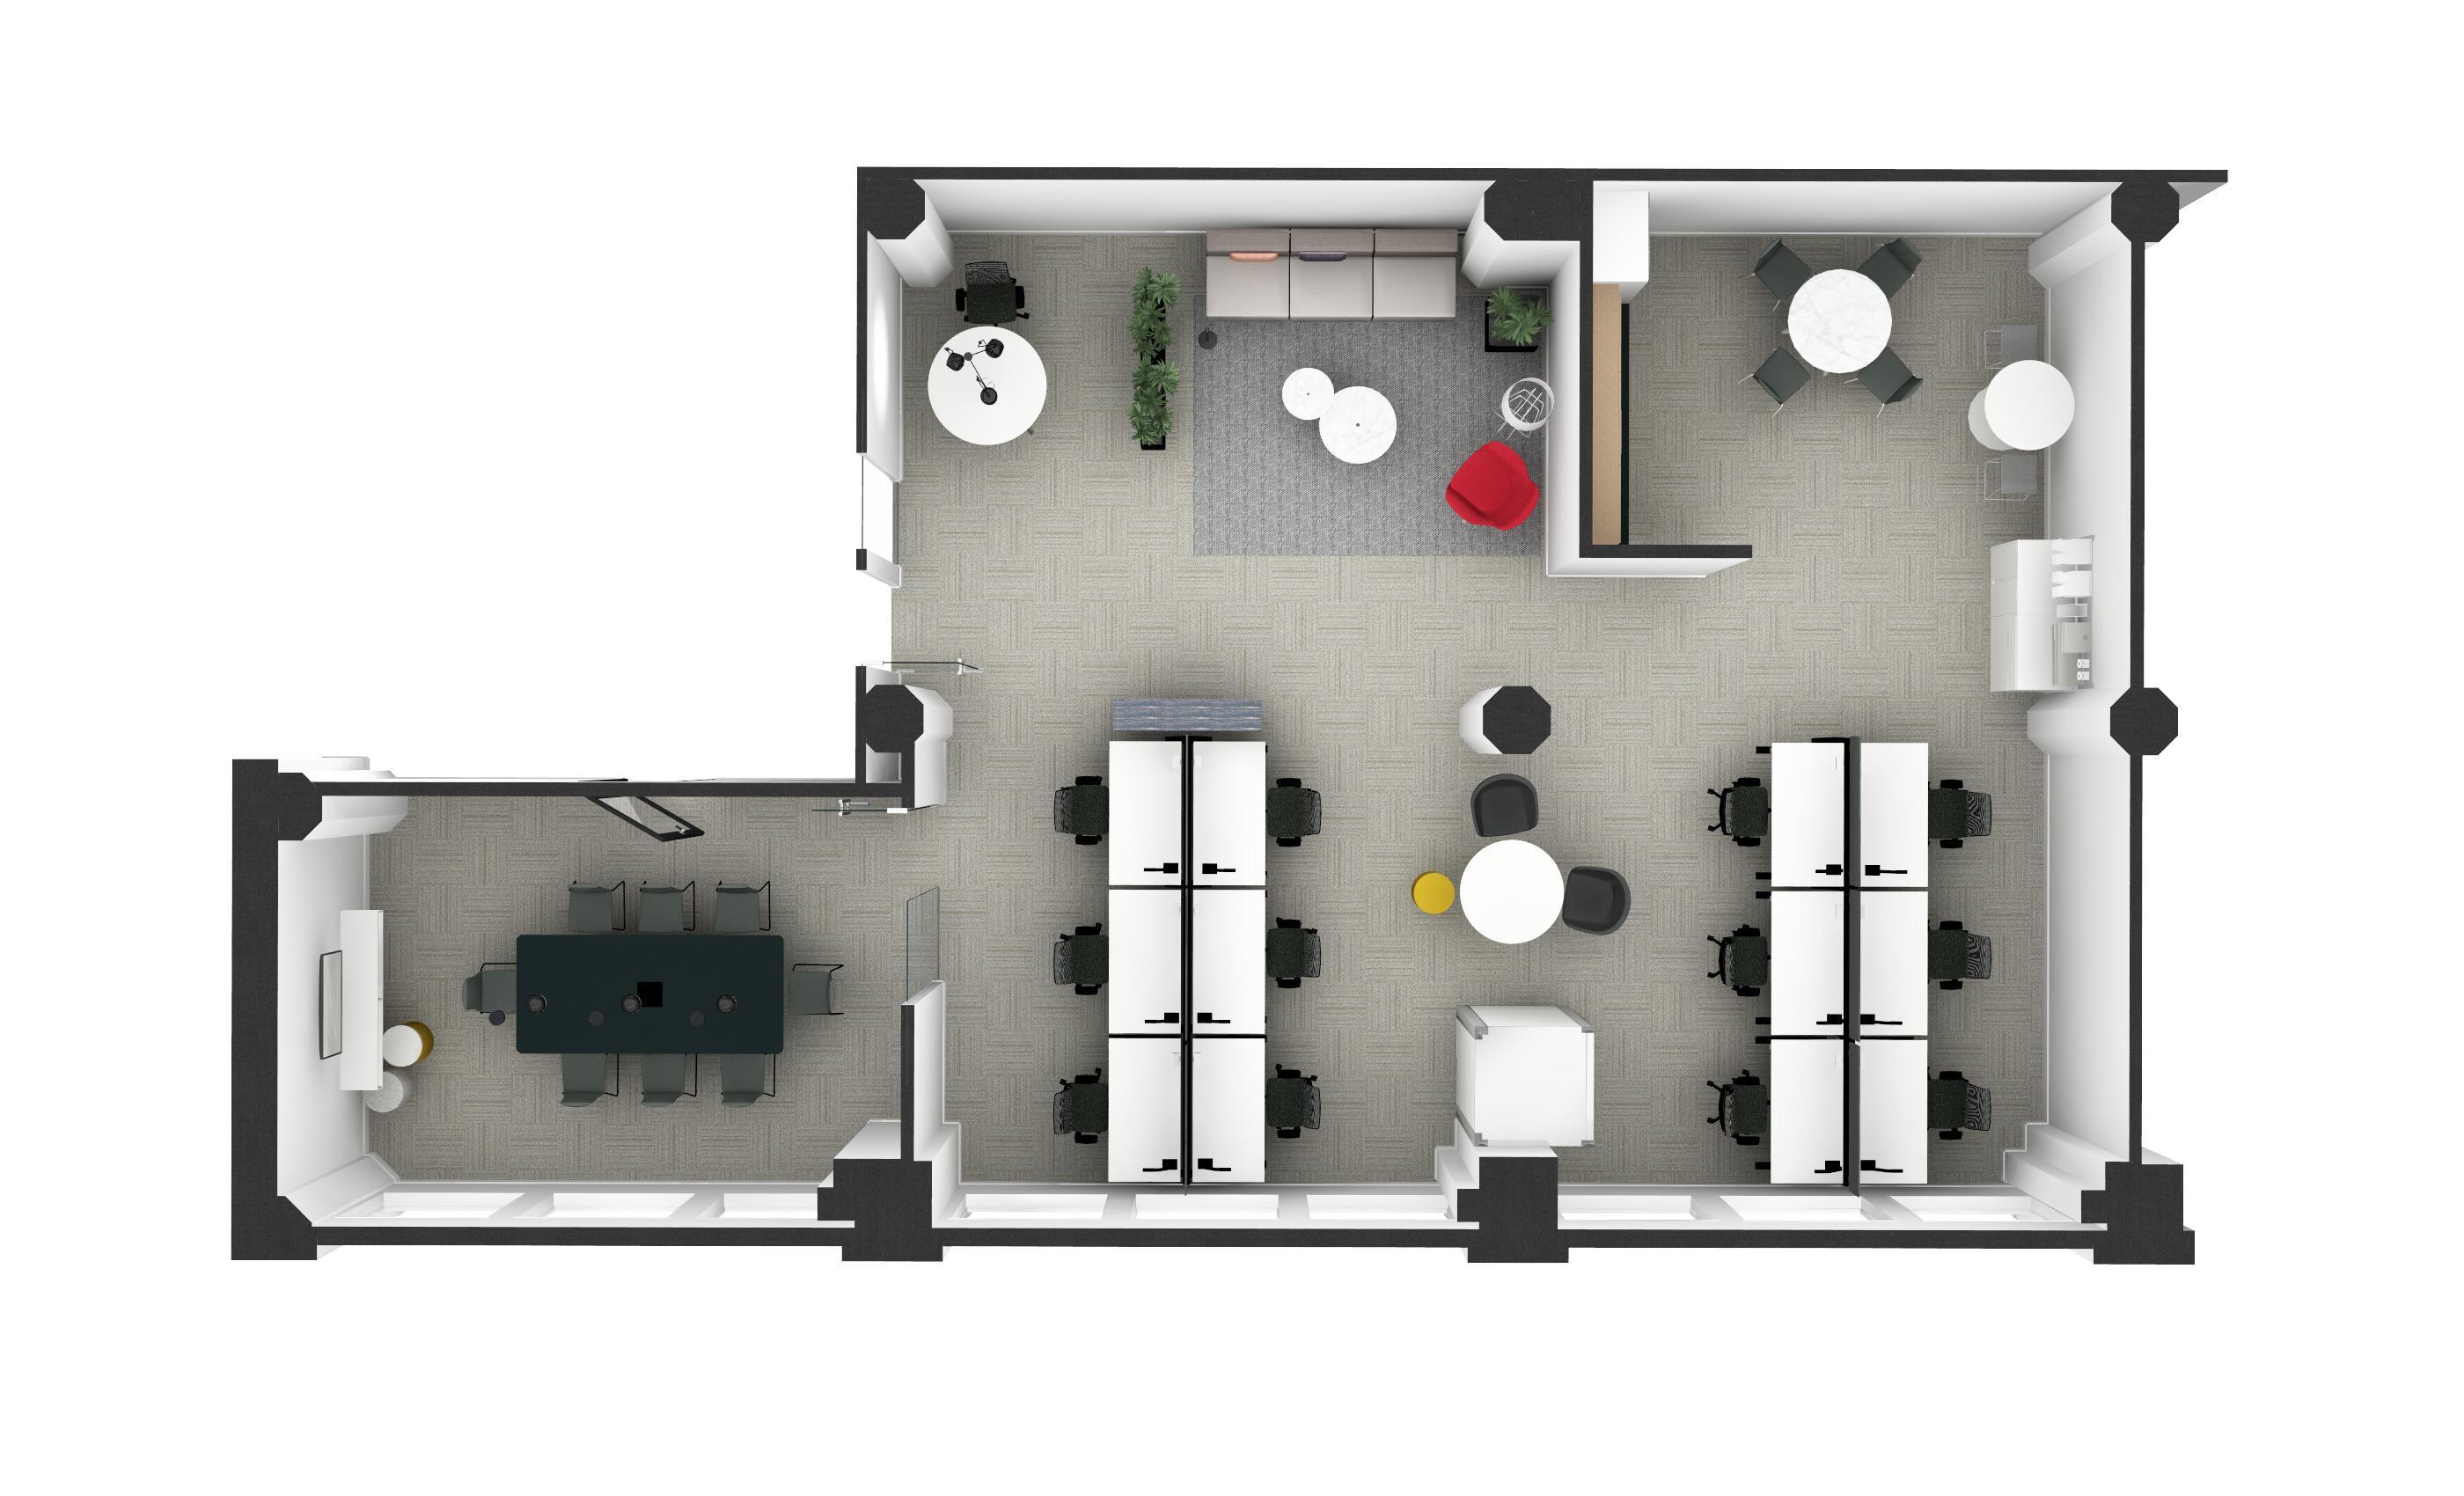 Manchester | Loyalty Building - Suite 600 - altSpace